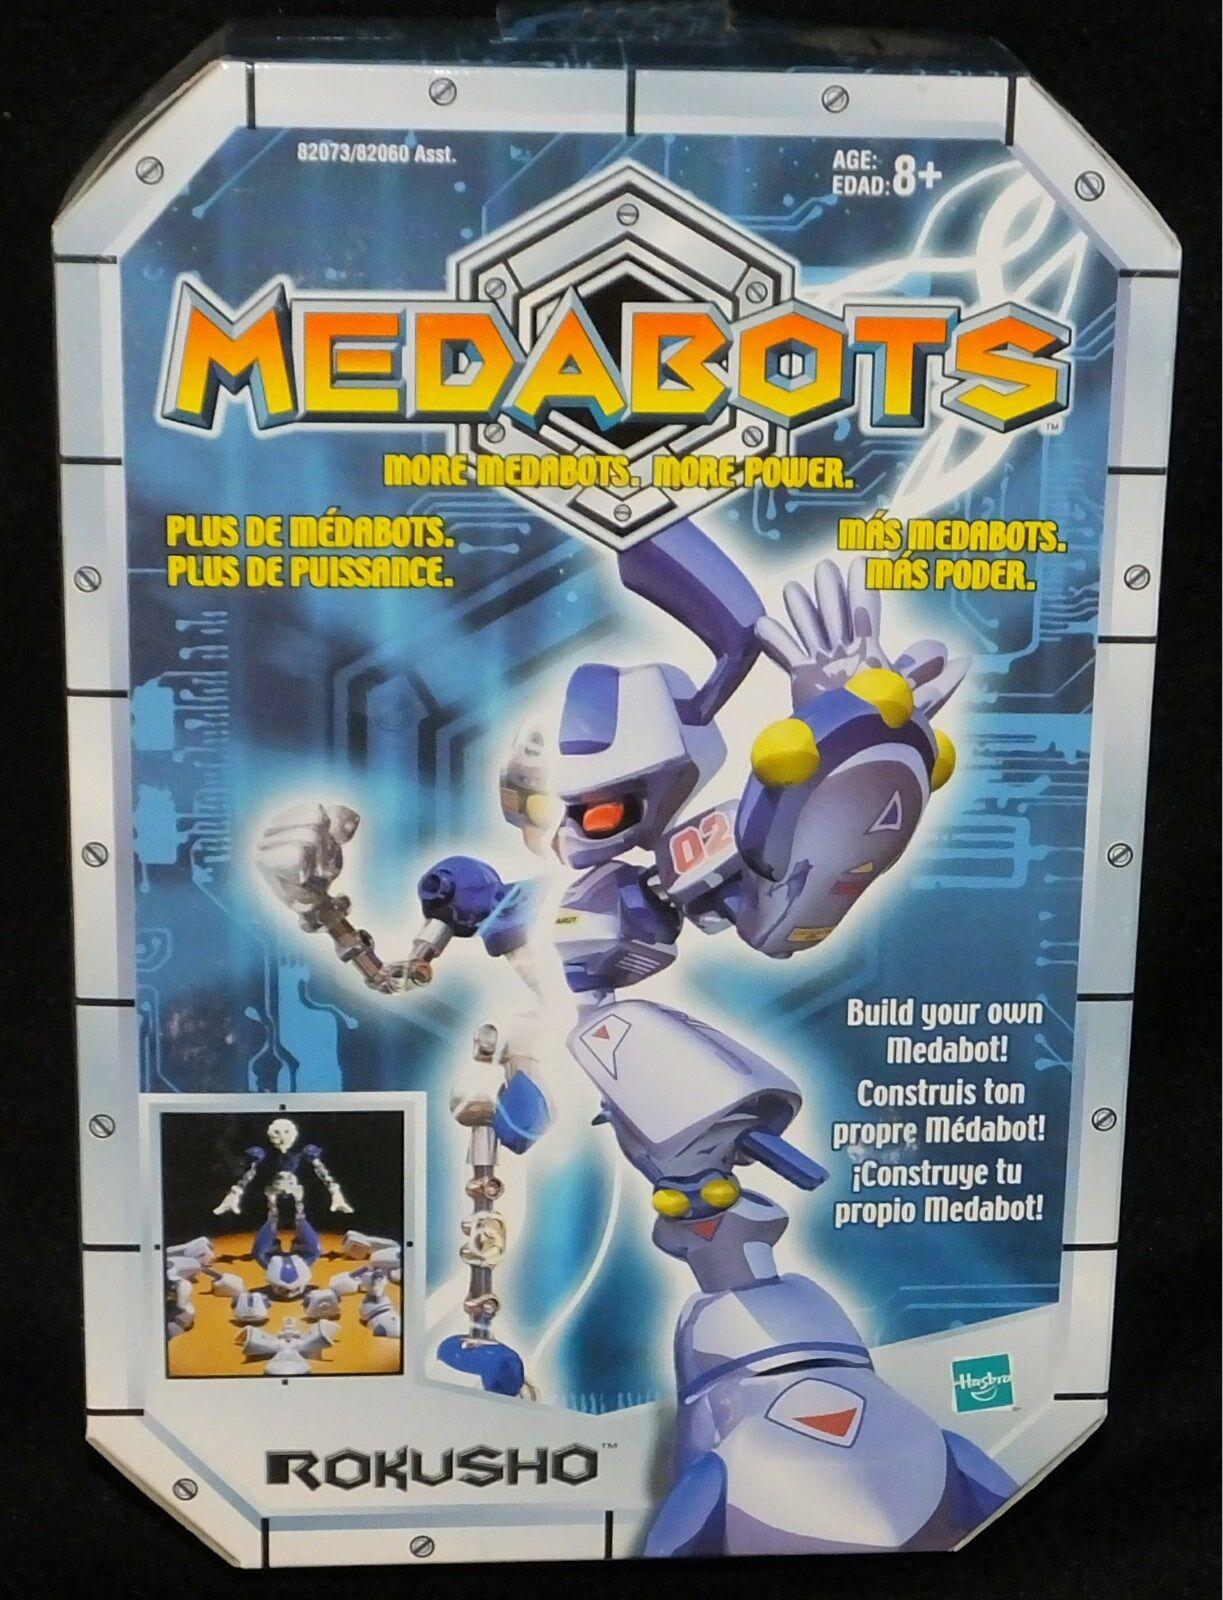 Medabots Build Your Own Kits 6  Rokusho New Factory Sealed Hasbro Medared 1997